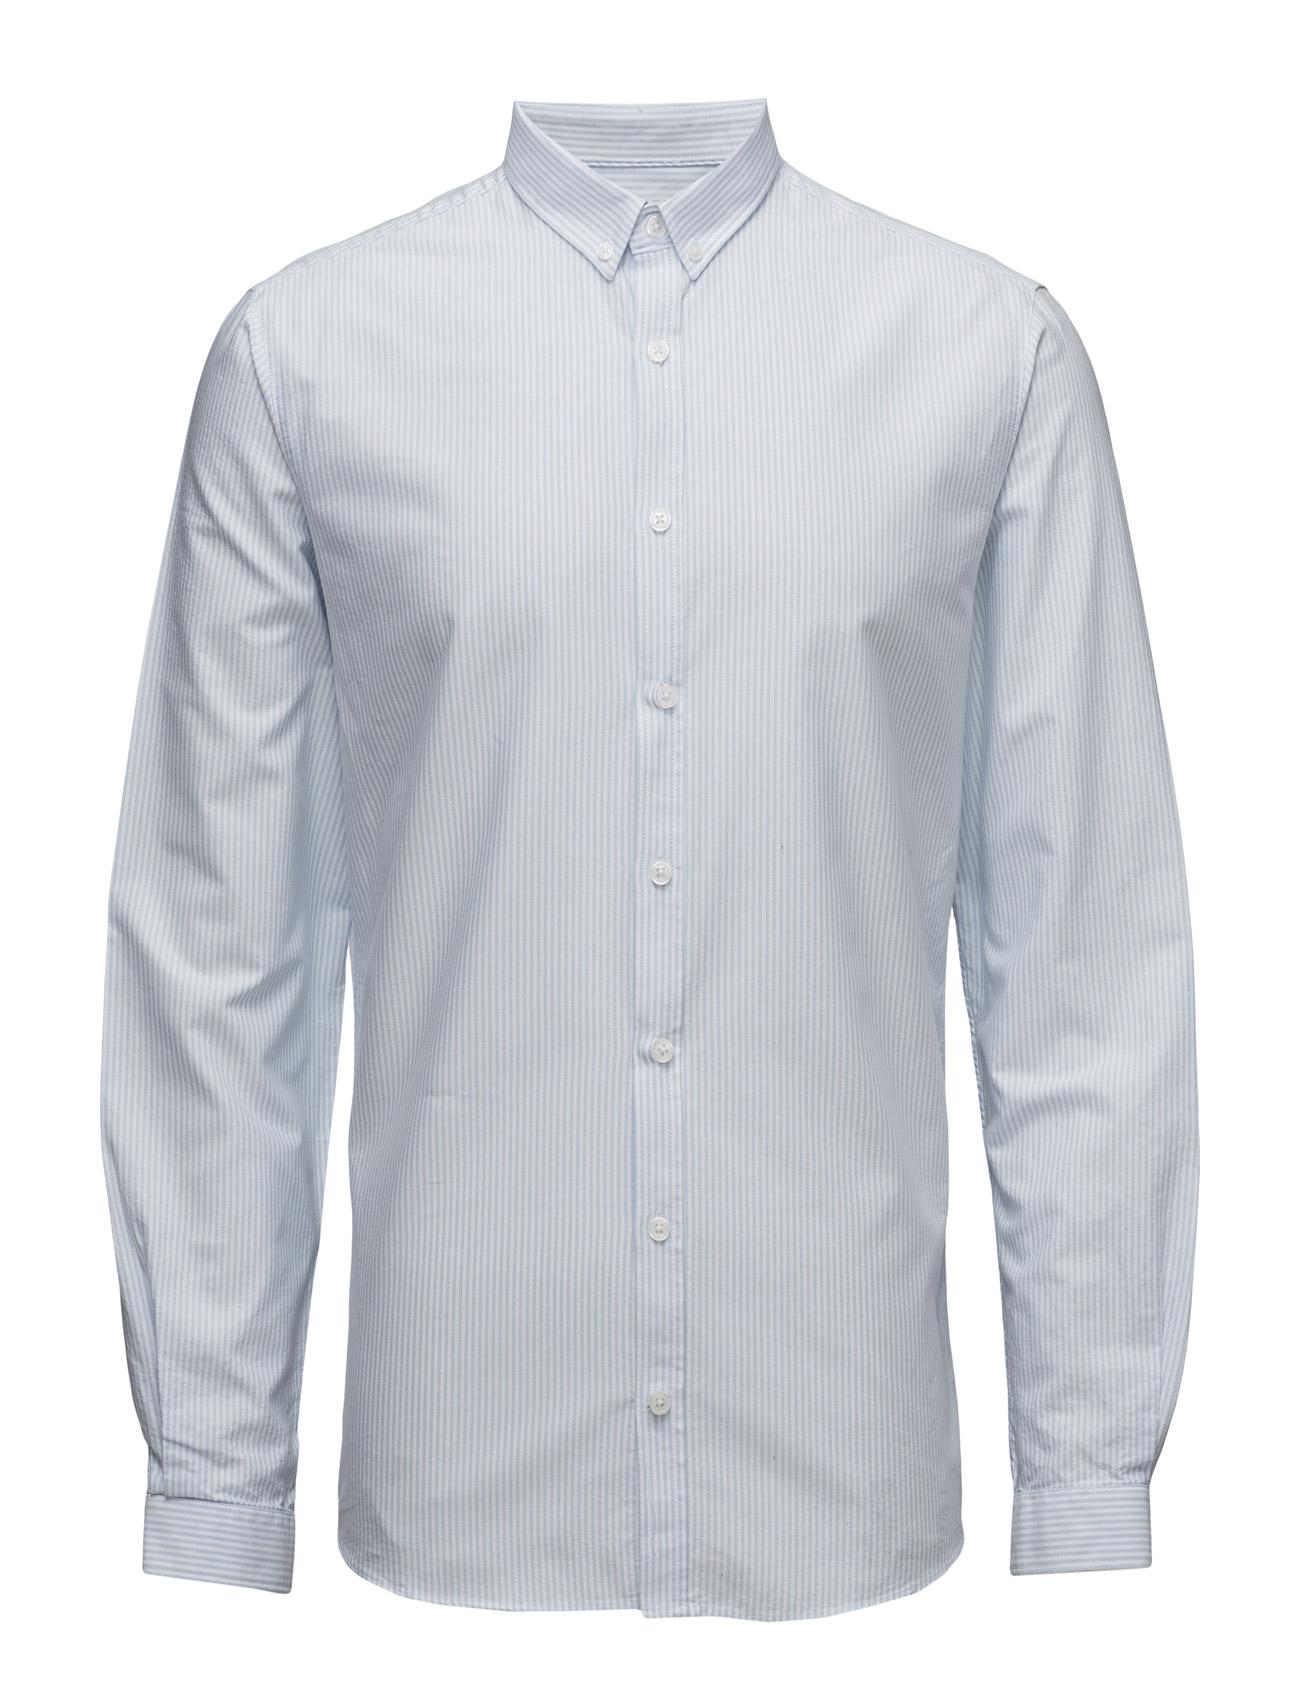 Lindbergh Striped oxford shirt L/S